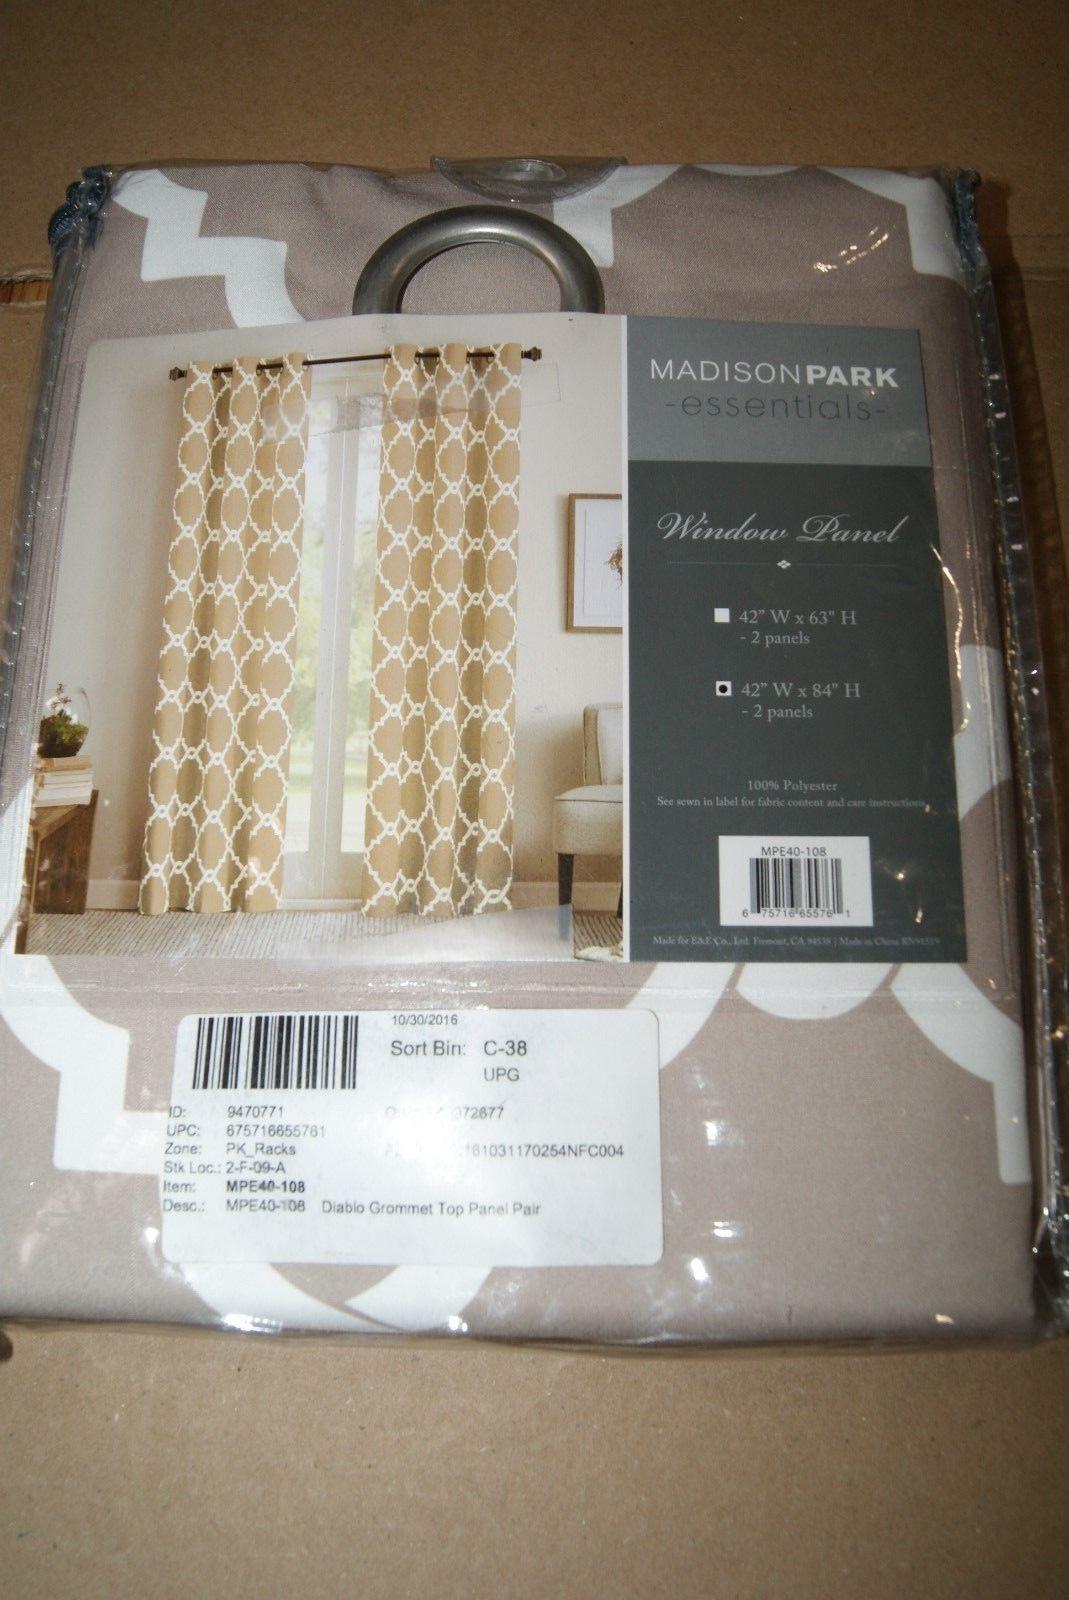 Madison Park Diablo Merritt Grommet Tan Geometric Window Panels Pair 84'L New - $26.60